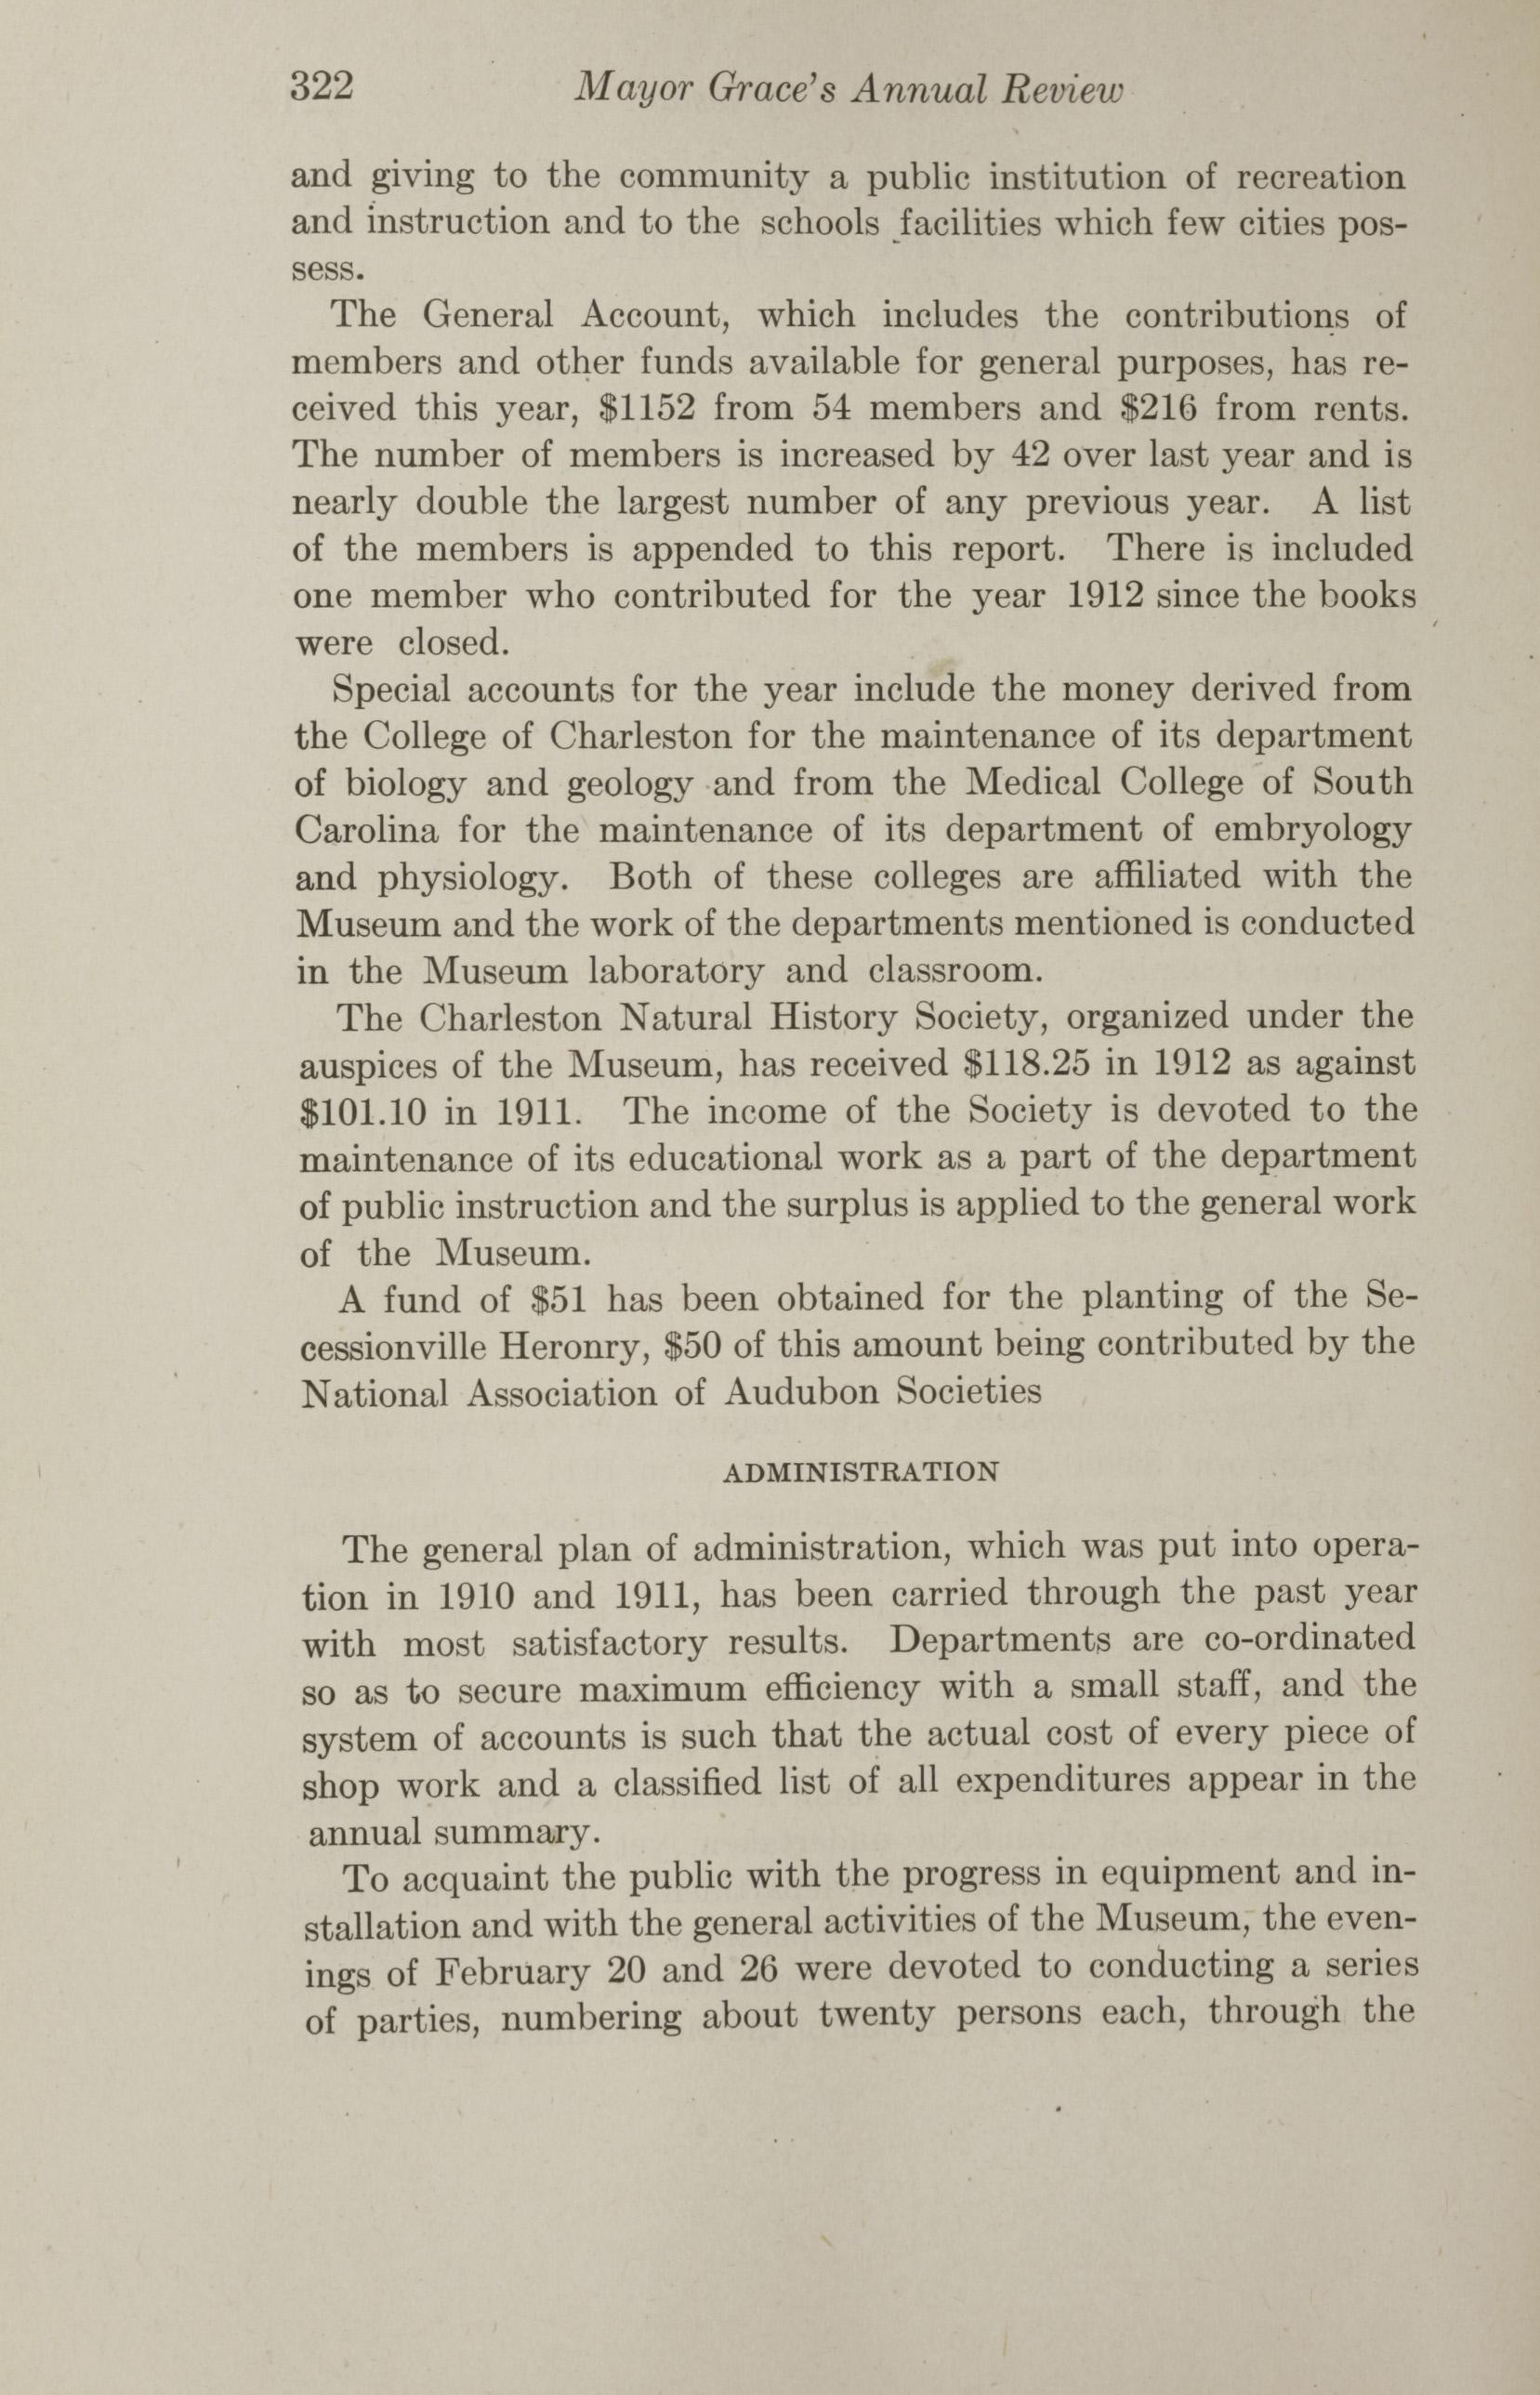 Charleston Yearbook, 1912, page 322